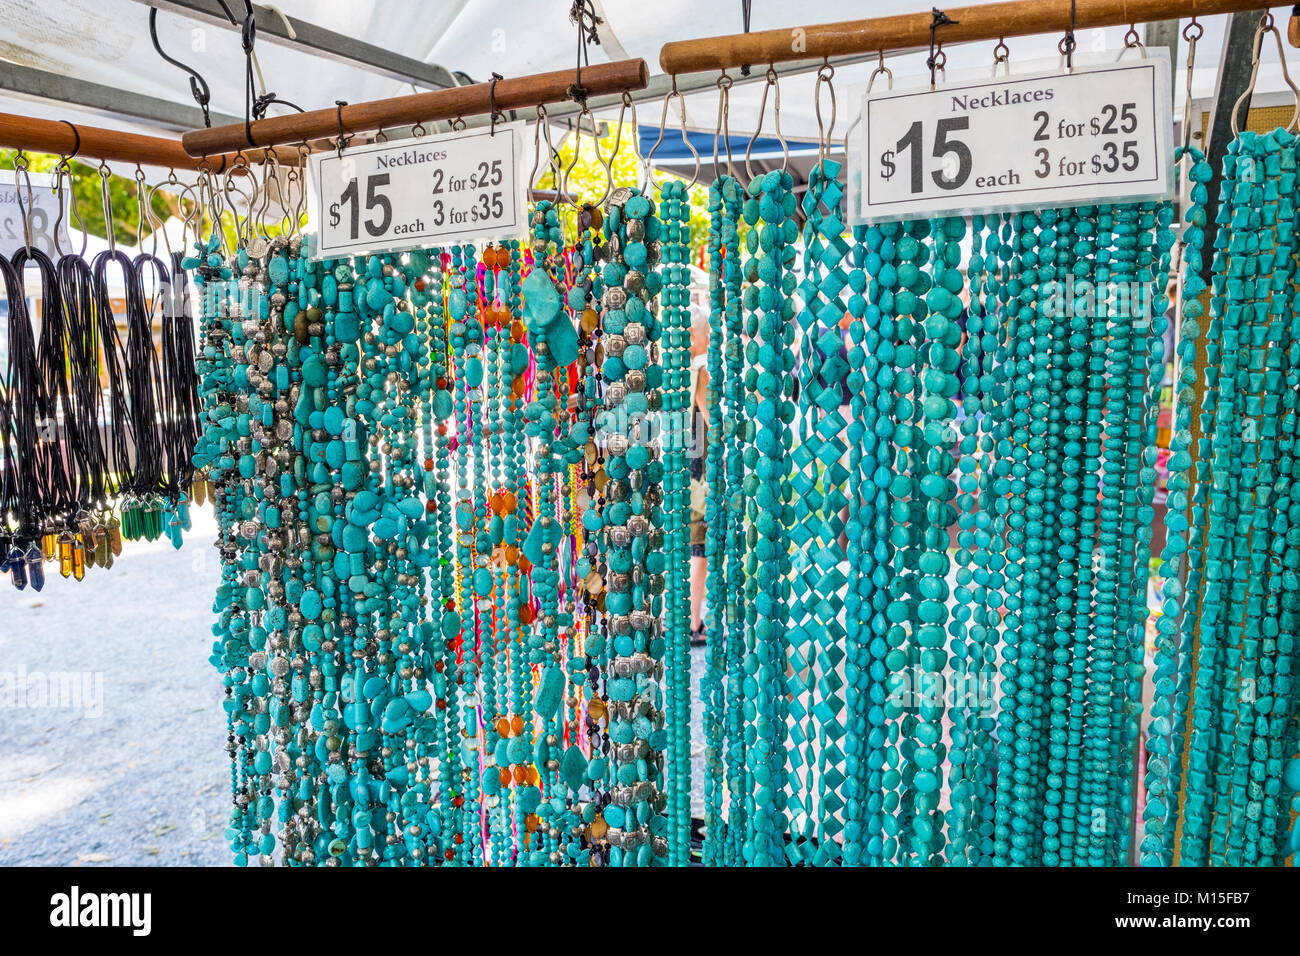 Necklaces and bracelets for sale at a stall in Port Douglas market,Port Douglas Queensland,Australia - Stock Image